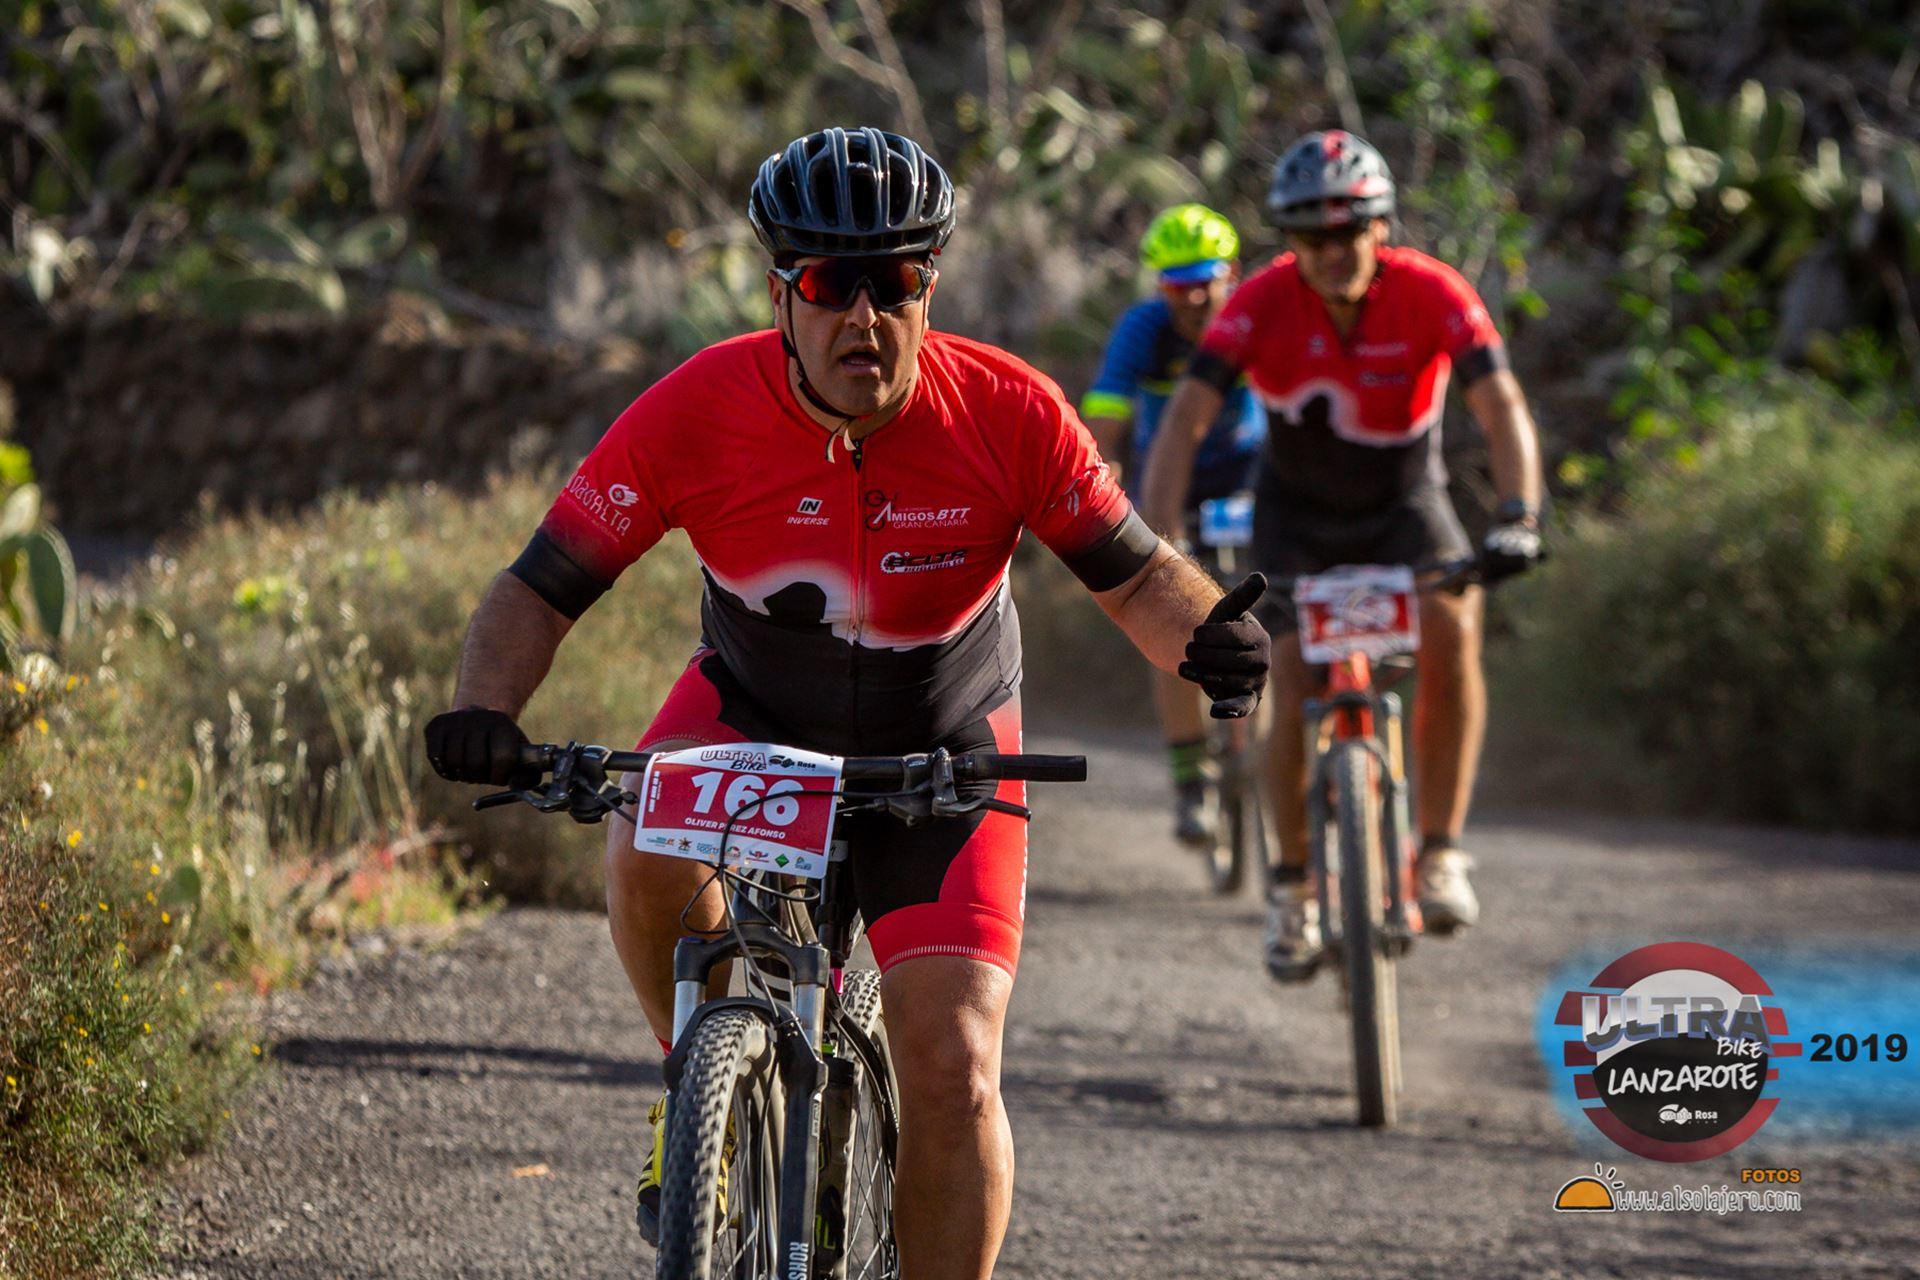 Sector Guatiza 2ª Etapa Ultrabike 2019 Fotos Alsolajero.com-146